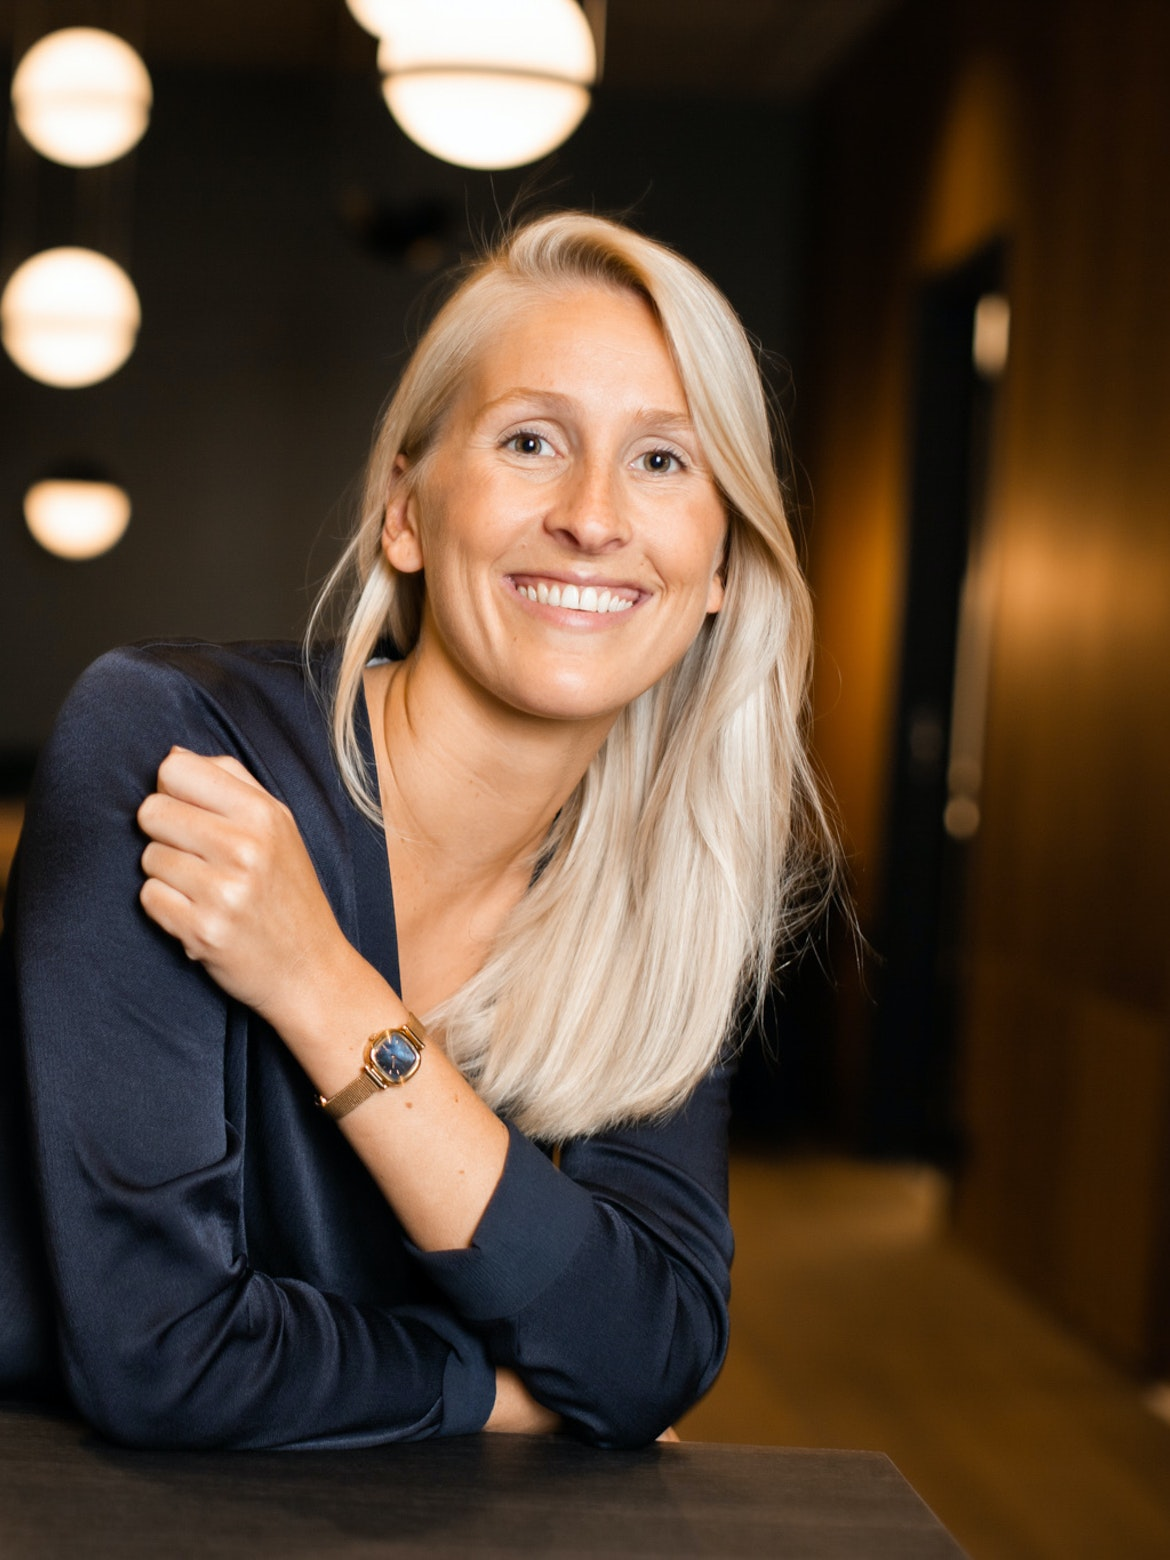 Maren Kristine Brokke 1 1